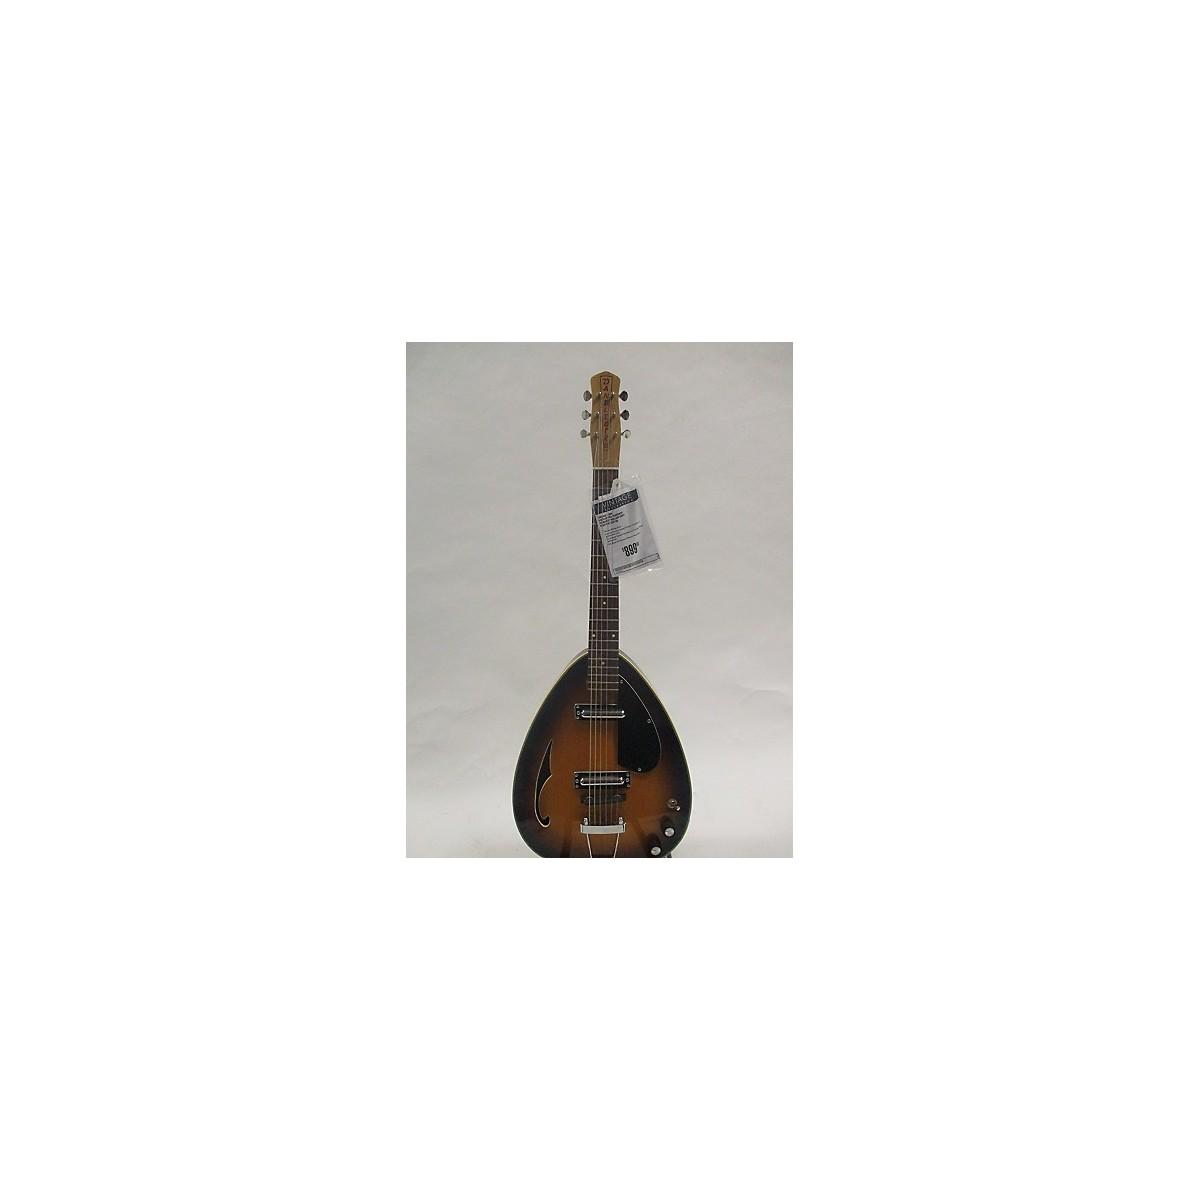 Danelectro 1969 Teardrop Hollow Body Electric Guitar